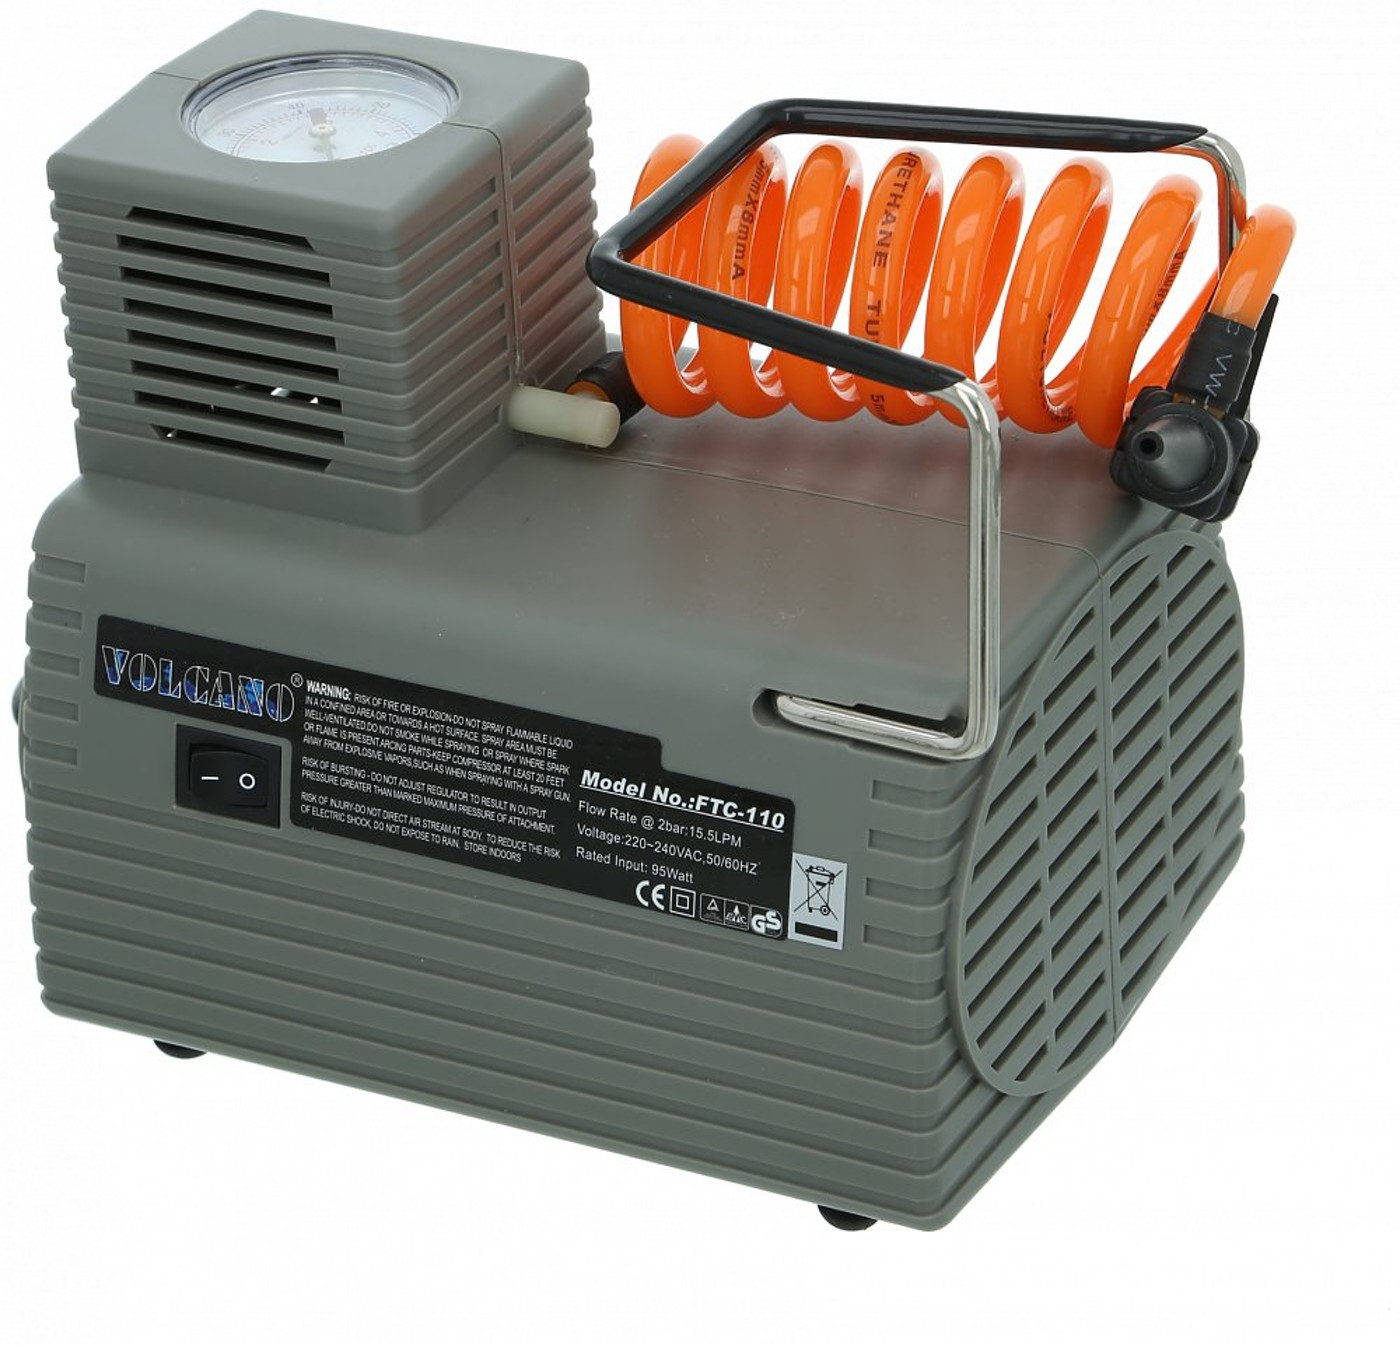 V3TEC MINI ELECTRIC INFLATOR